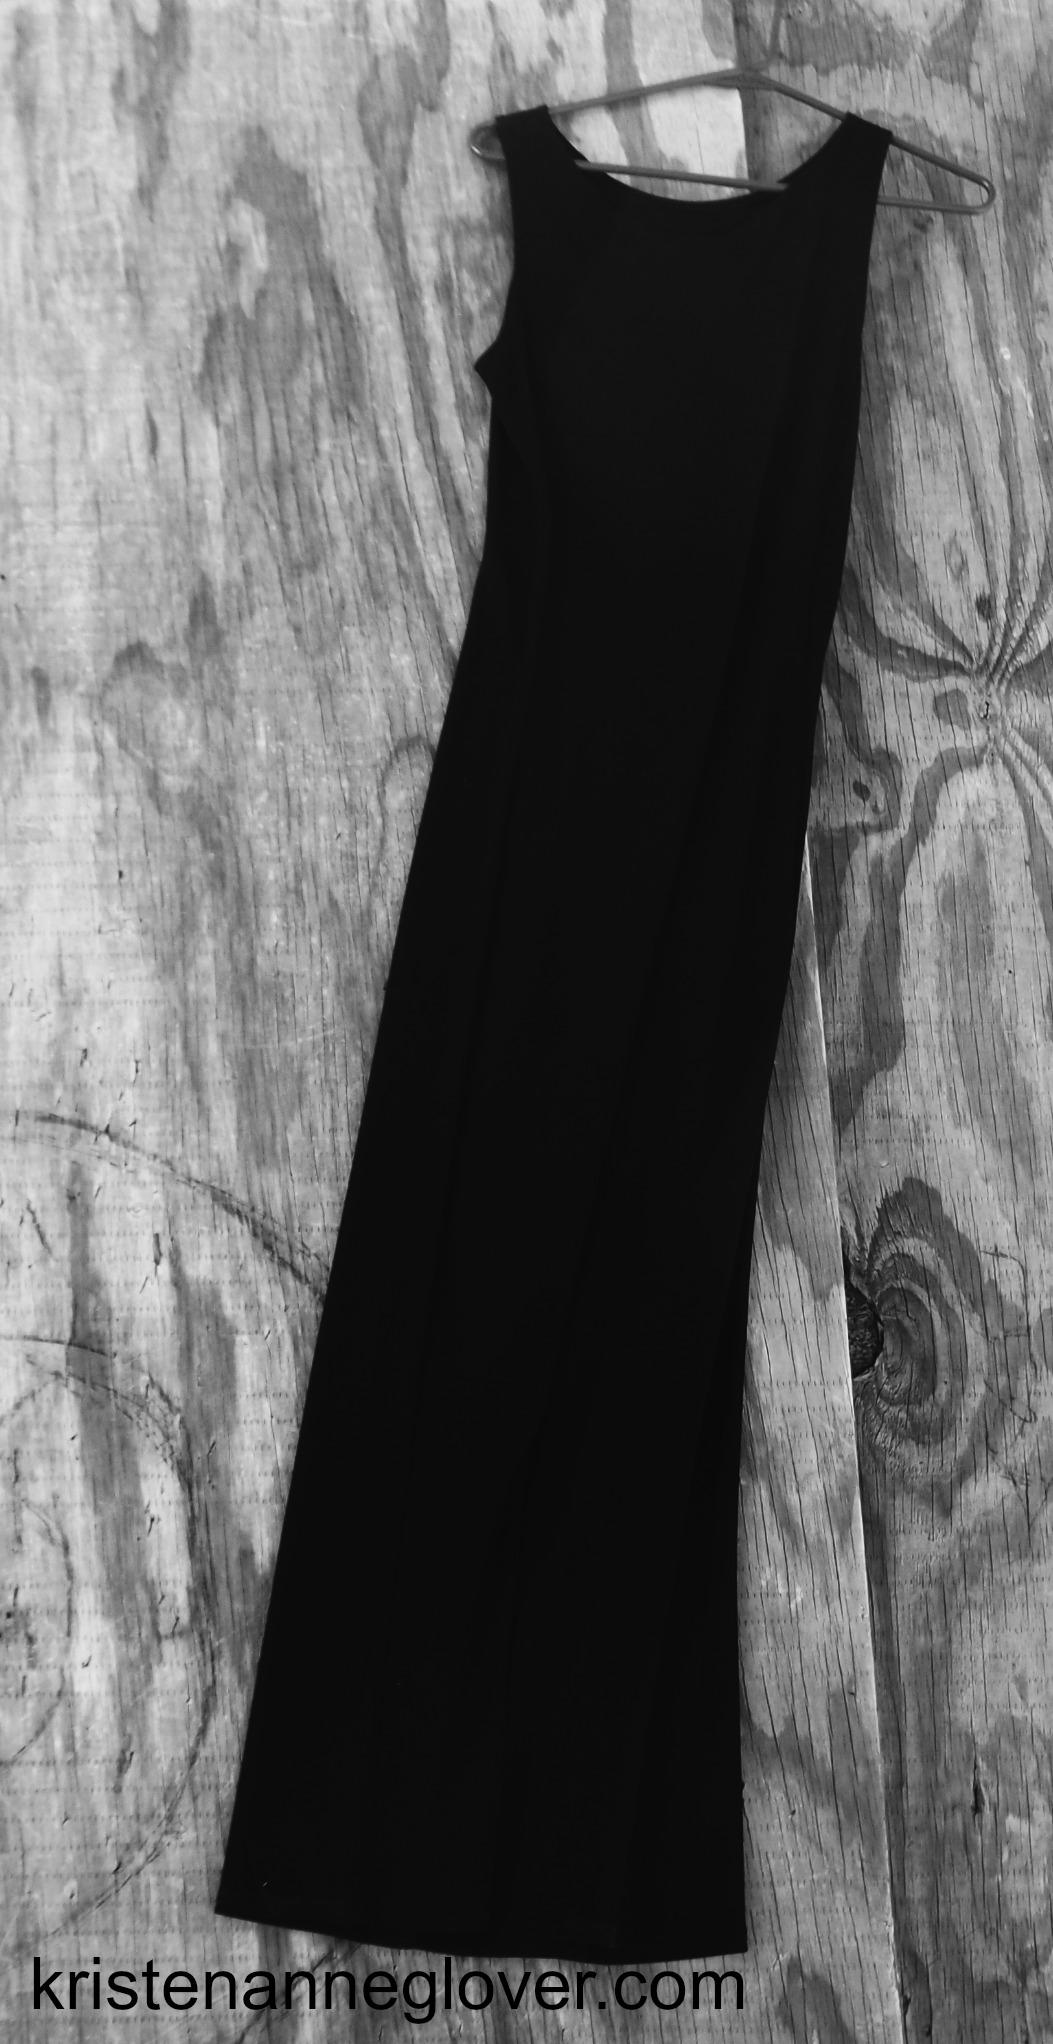 The Black Dress